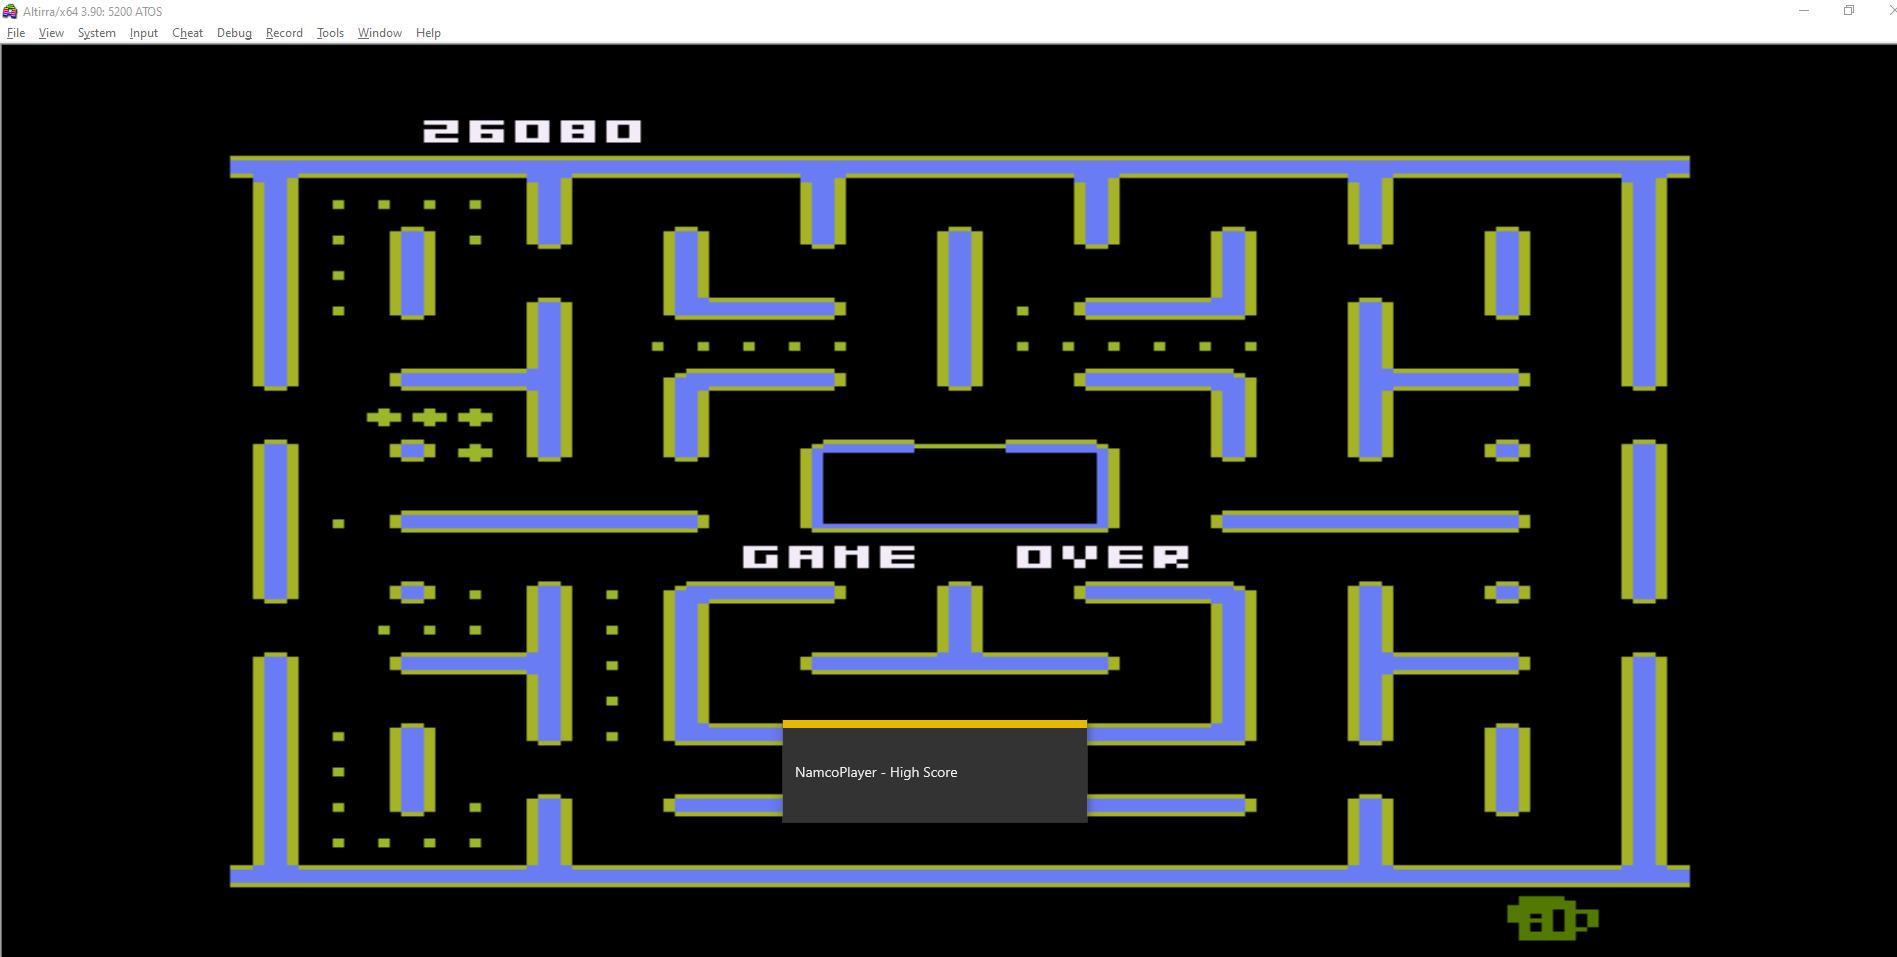 NamcoPlayer: Jr. Pac-Man [Cat Start] (Atari 5200 Emulated) 26,080 points on 2020-10-30 15:03:54